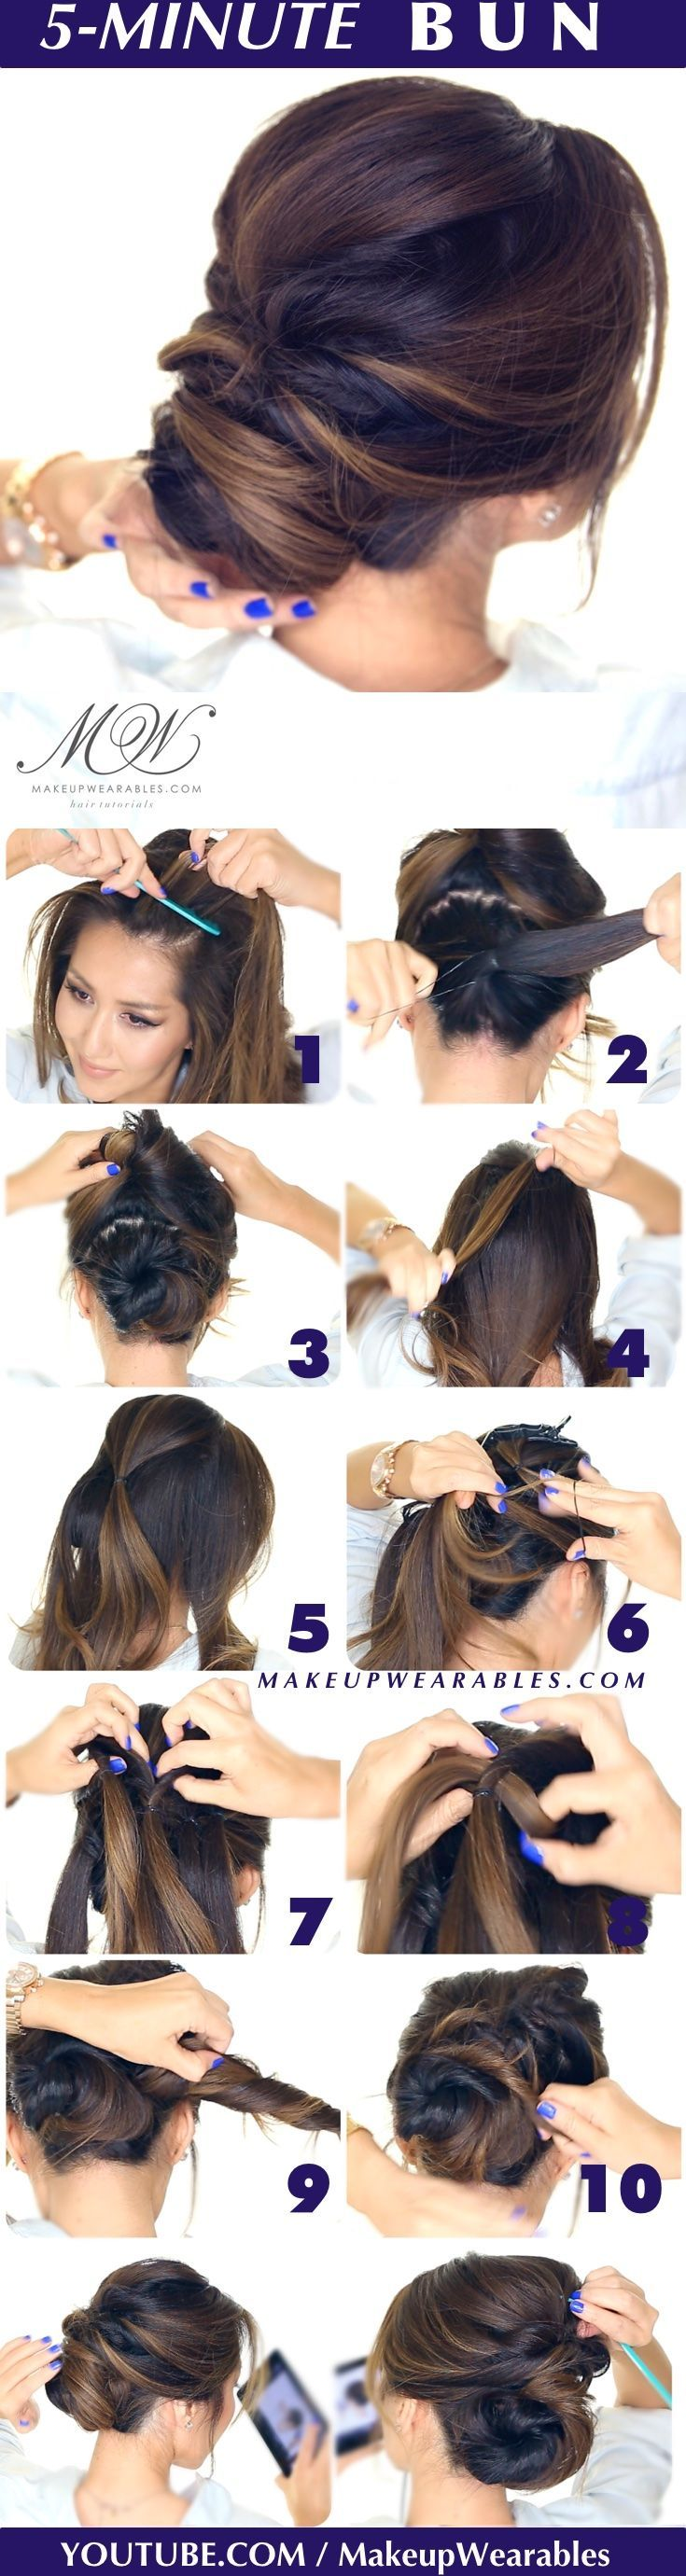 hair tutorial - easy romantic bun hairstyle - Elegant twisted bun hairstyles for homecoming prom wedding